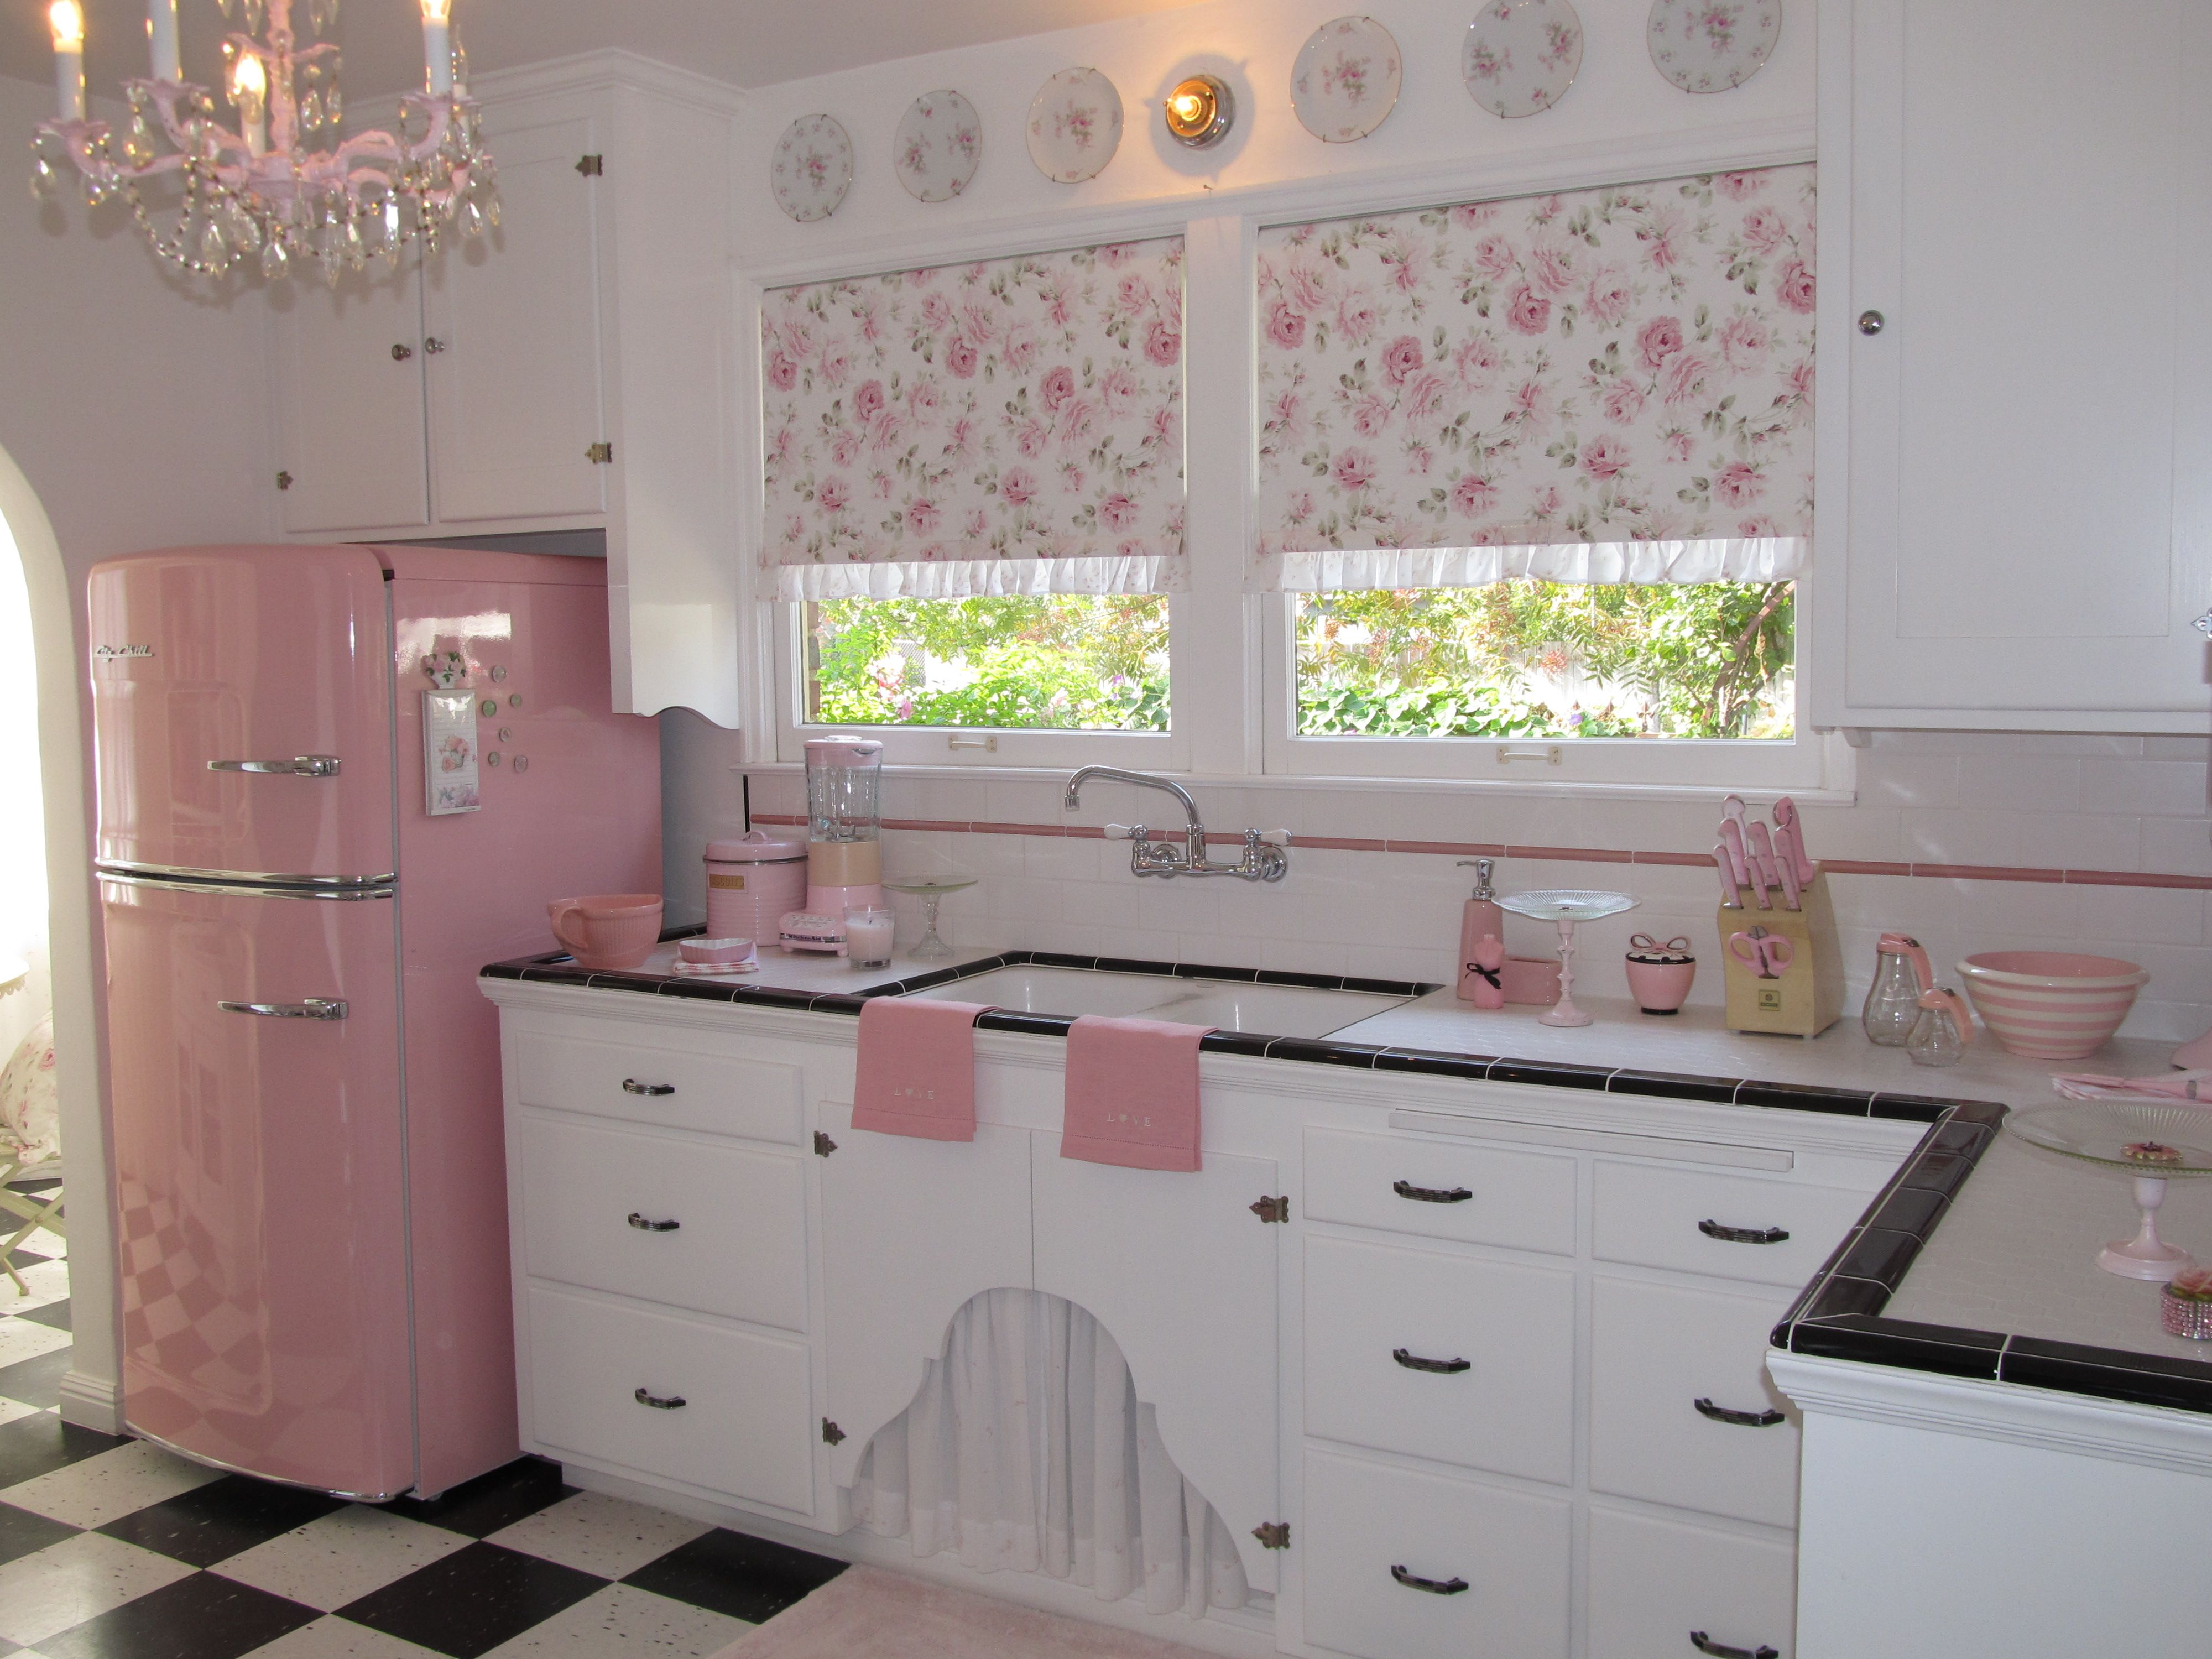 Kidkraft large pastel kitchen  Mais de  inspirações para sua cozinha  Retro pink kitchens Black